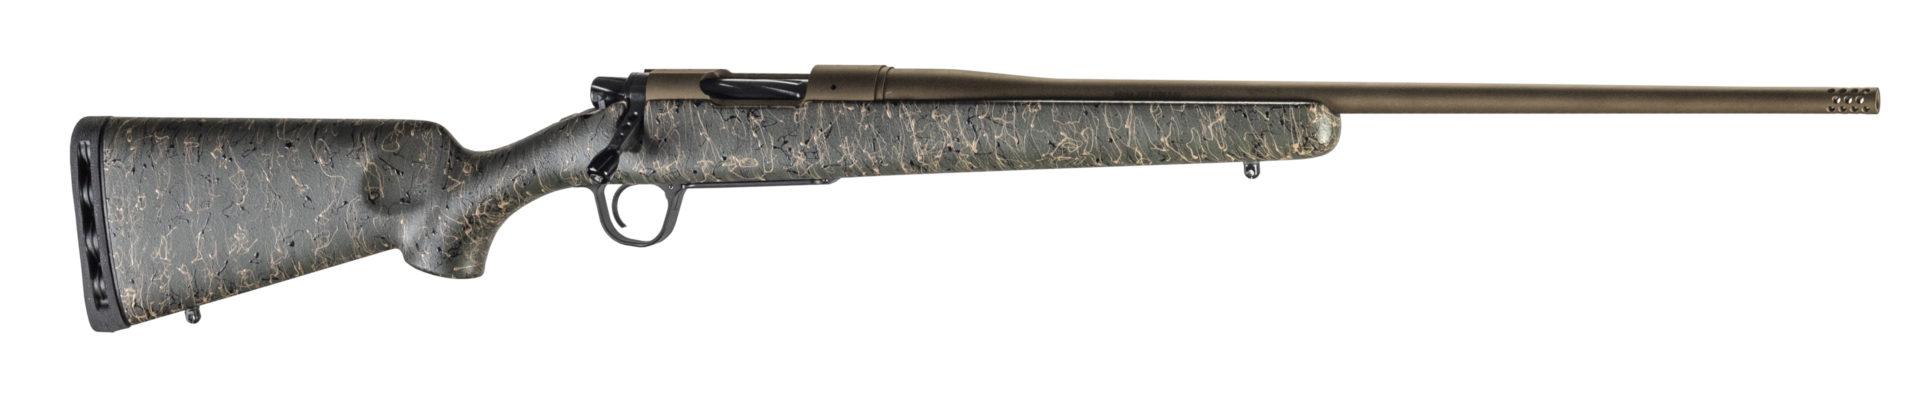 Christensen Arms Mesa rifle.